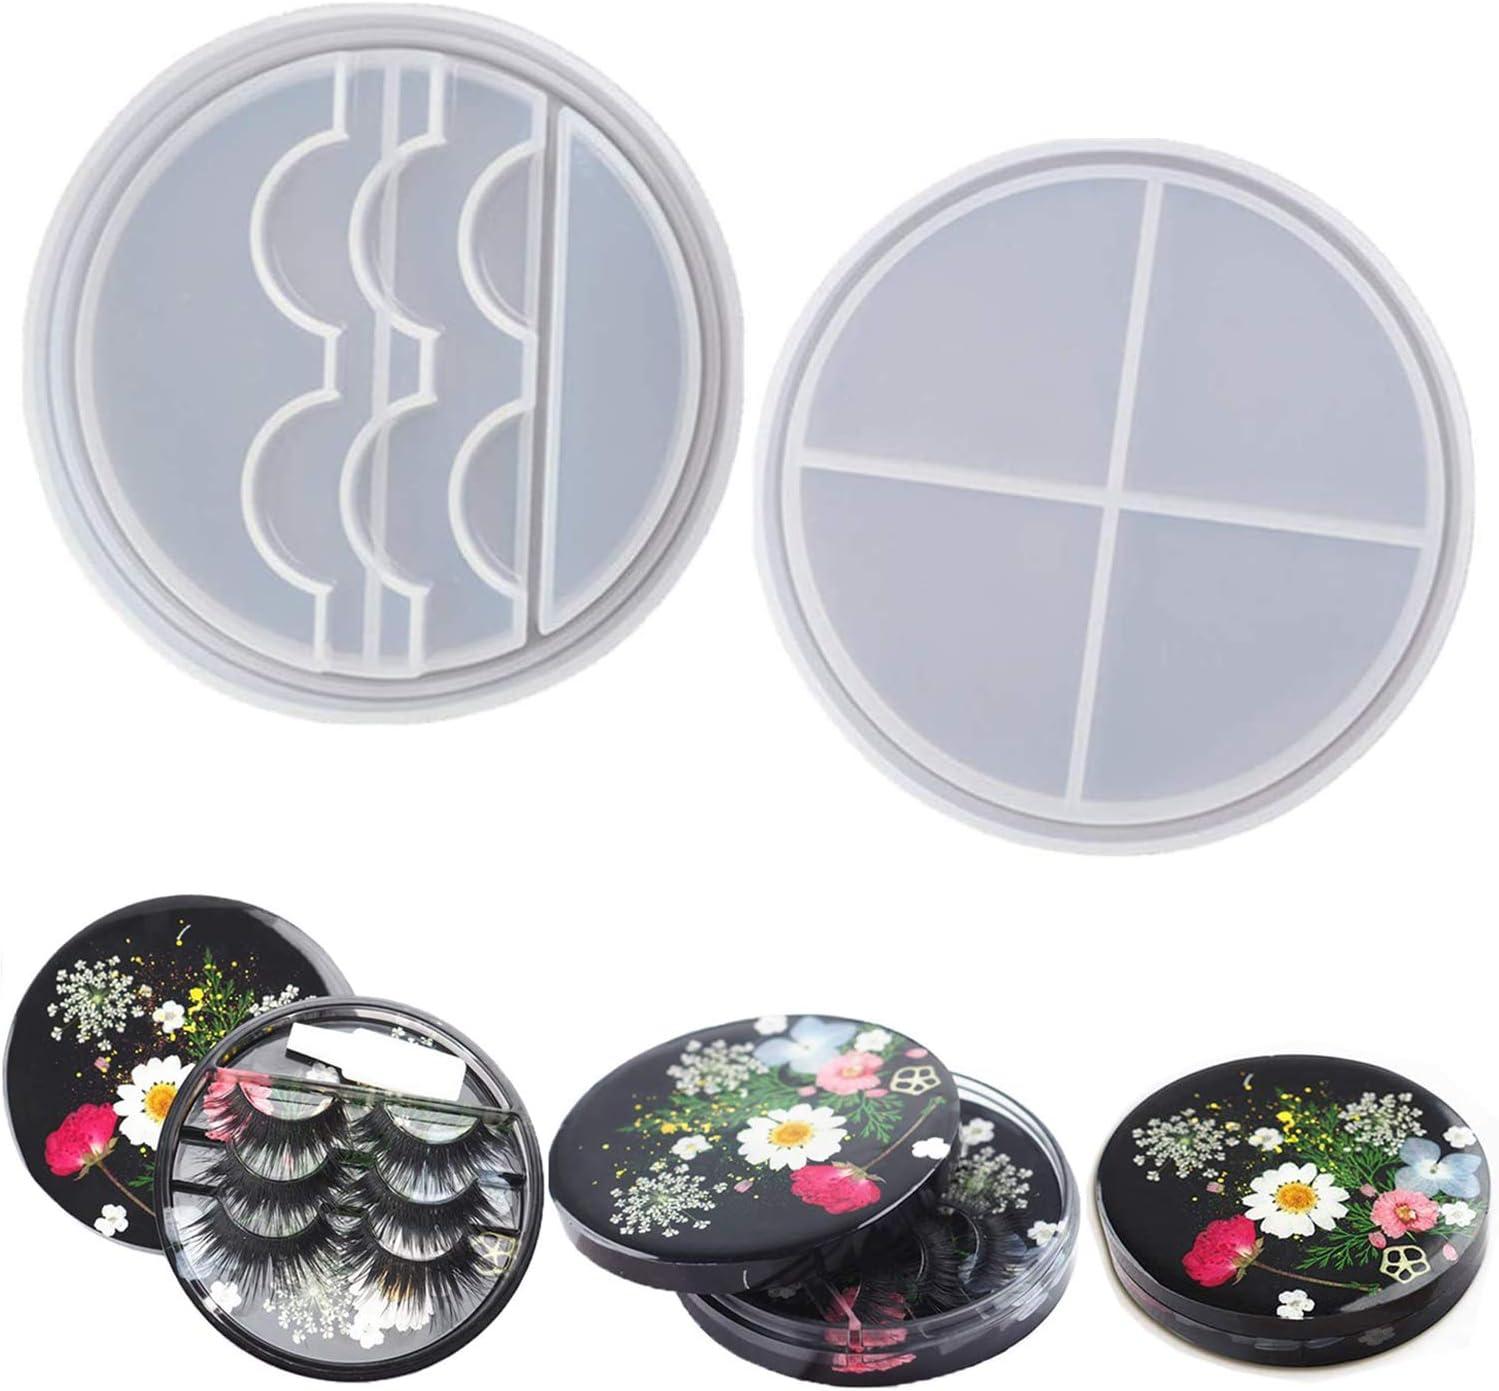 Eyelash Storage Box Resin Elegant Mold Cosmetic Case Lid Eye Round with Al sold out.